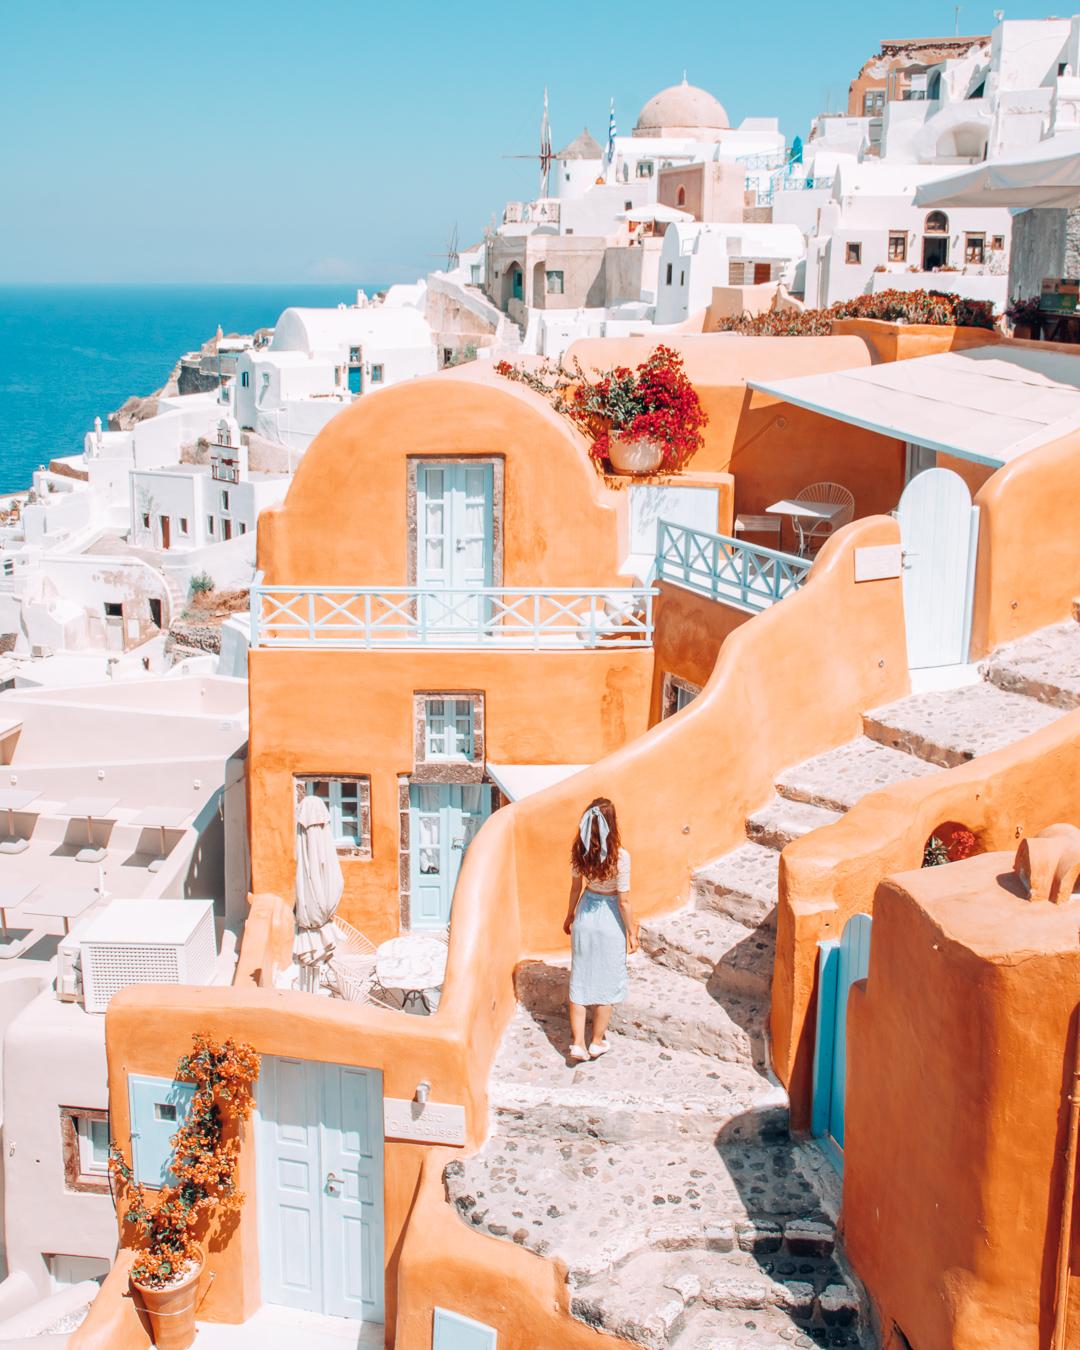 Orange building and white houses in Santorini